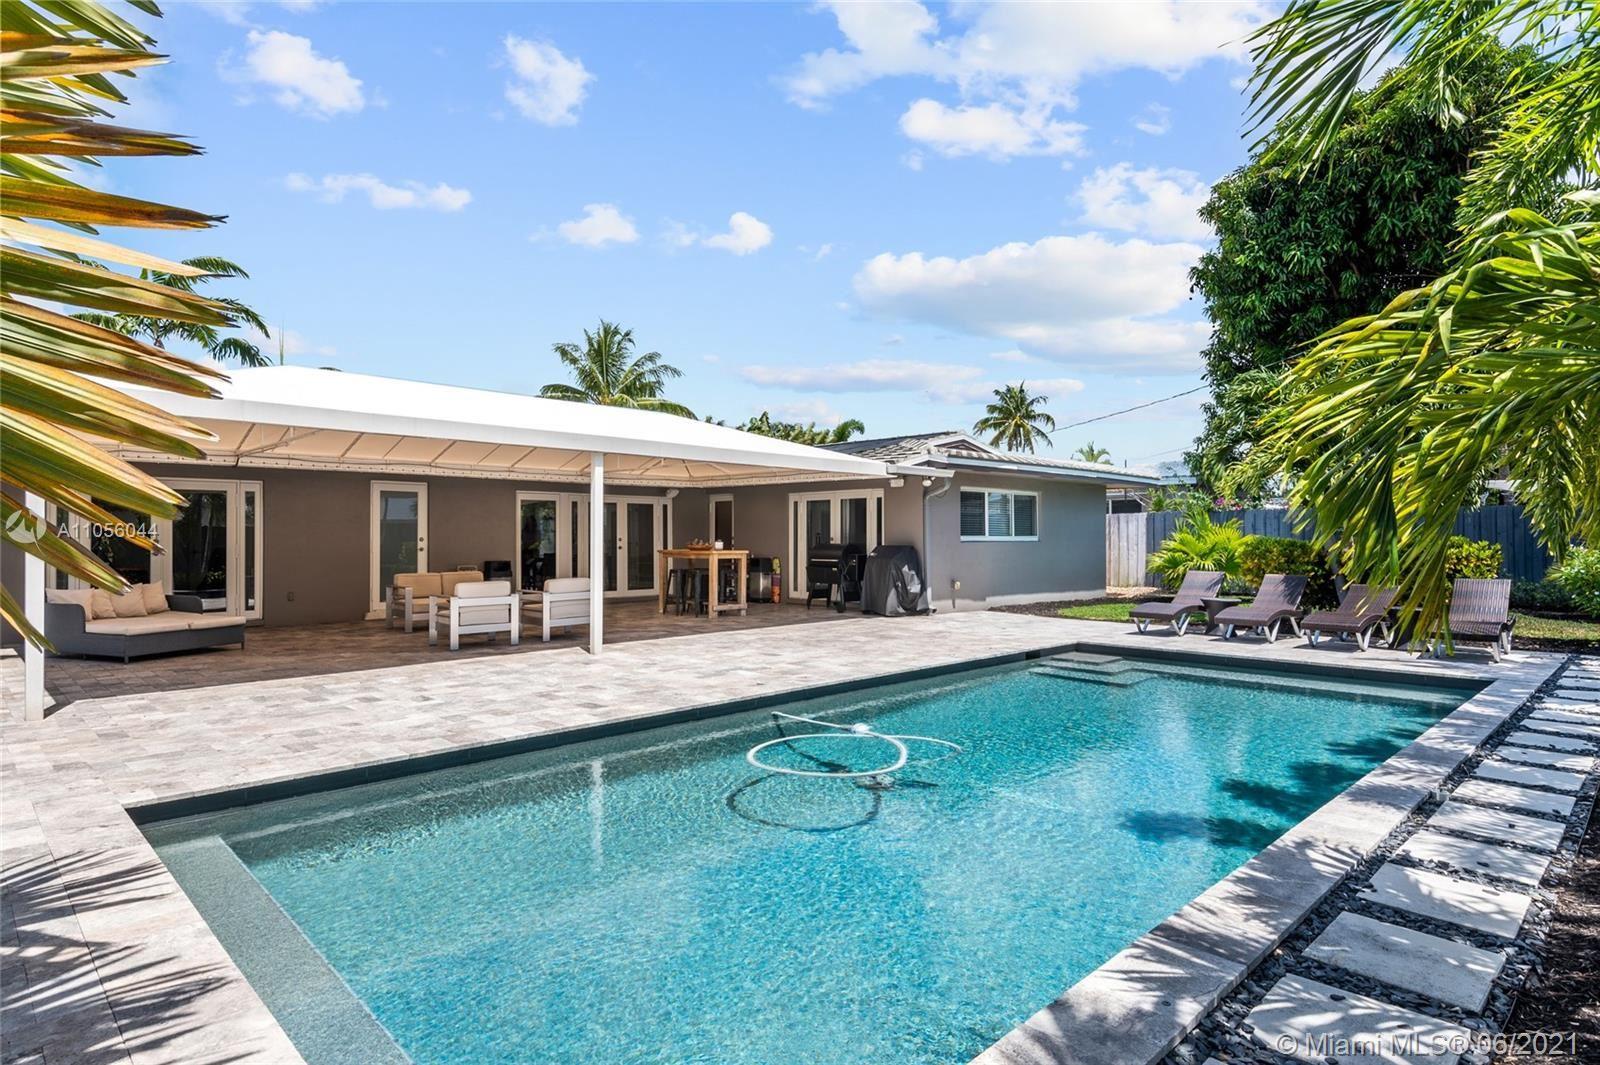 5200 NE 17th Ave, Fort Lauderdale, FL 33334 - #: A11056044